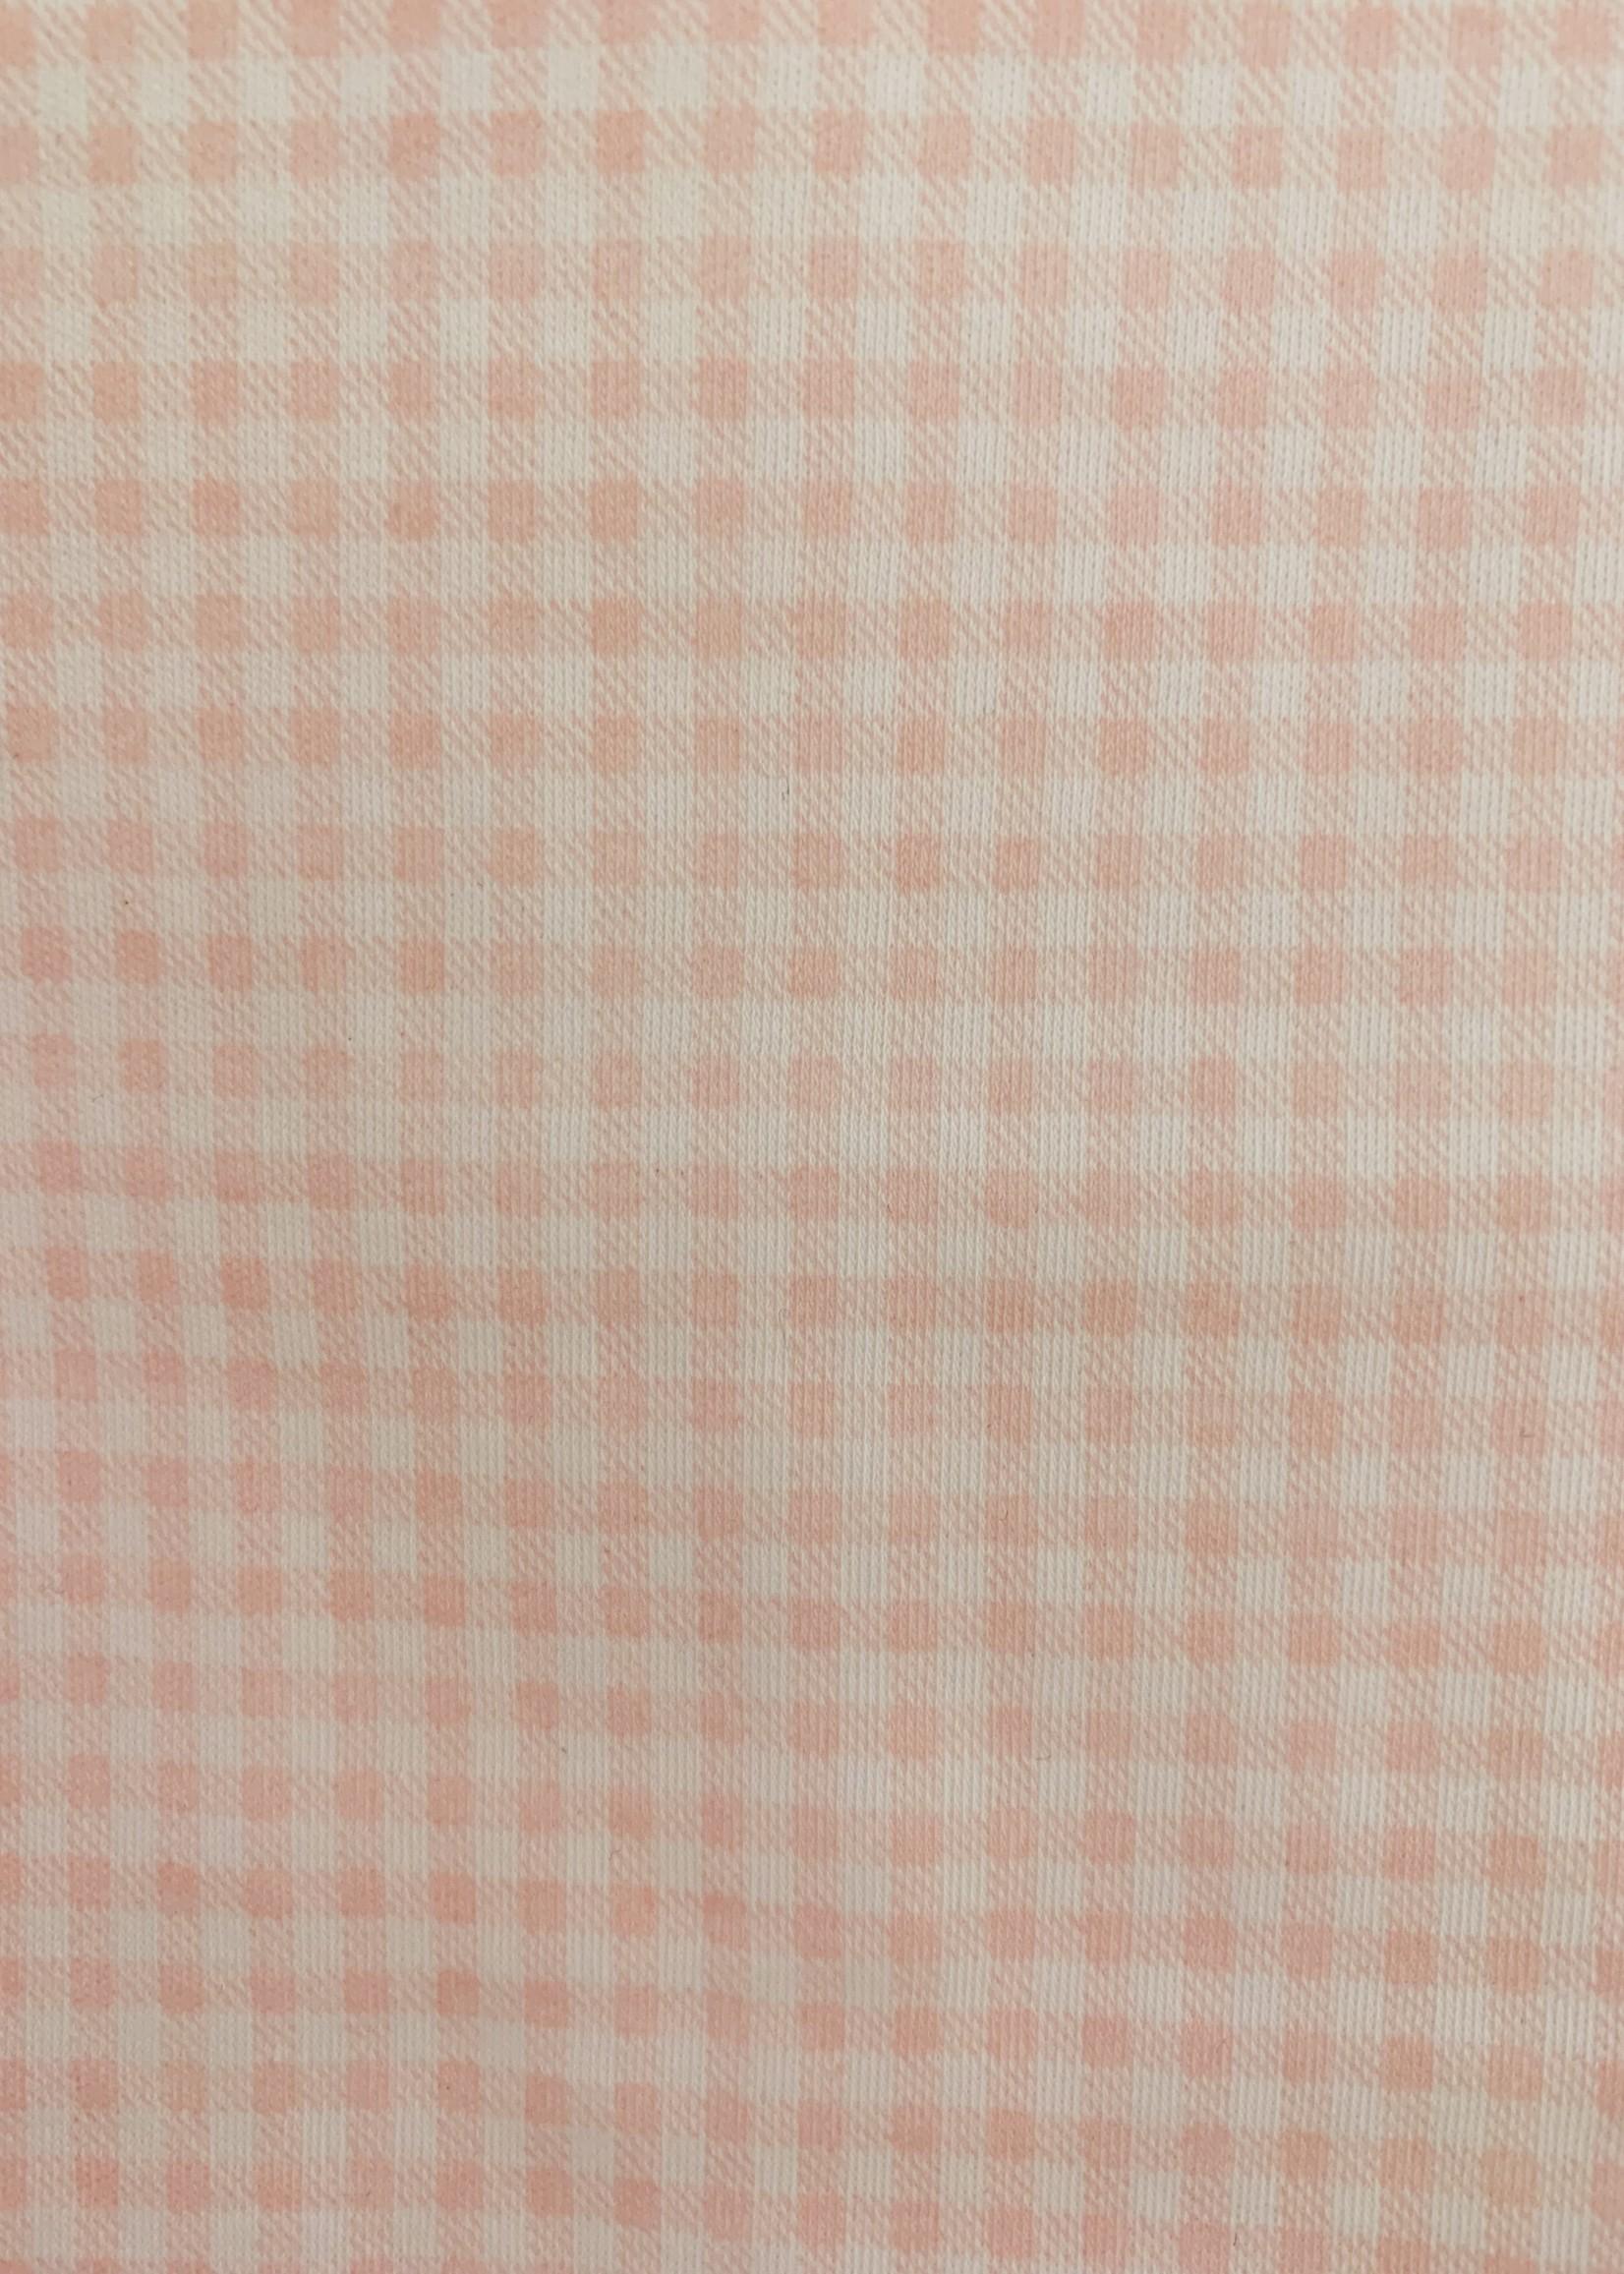 PINK VICHY BASICS CROCHET 2 PIECE SET